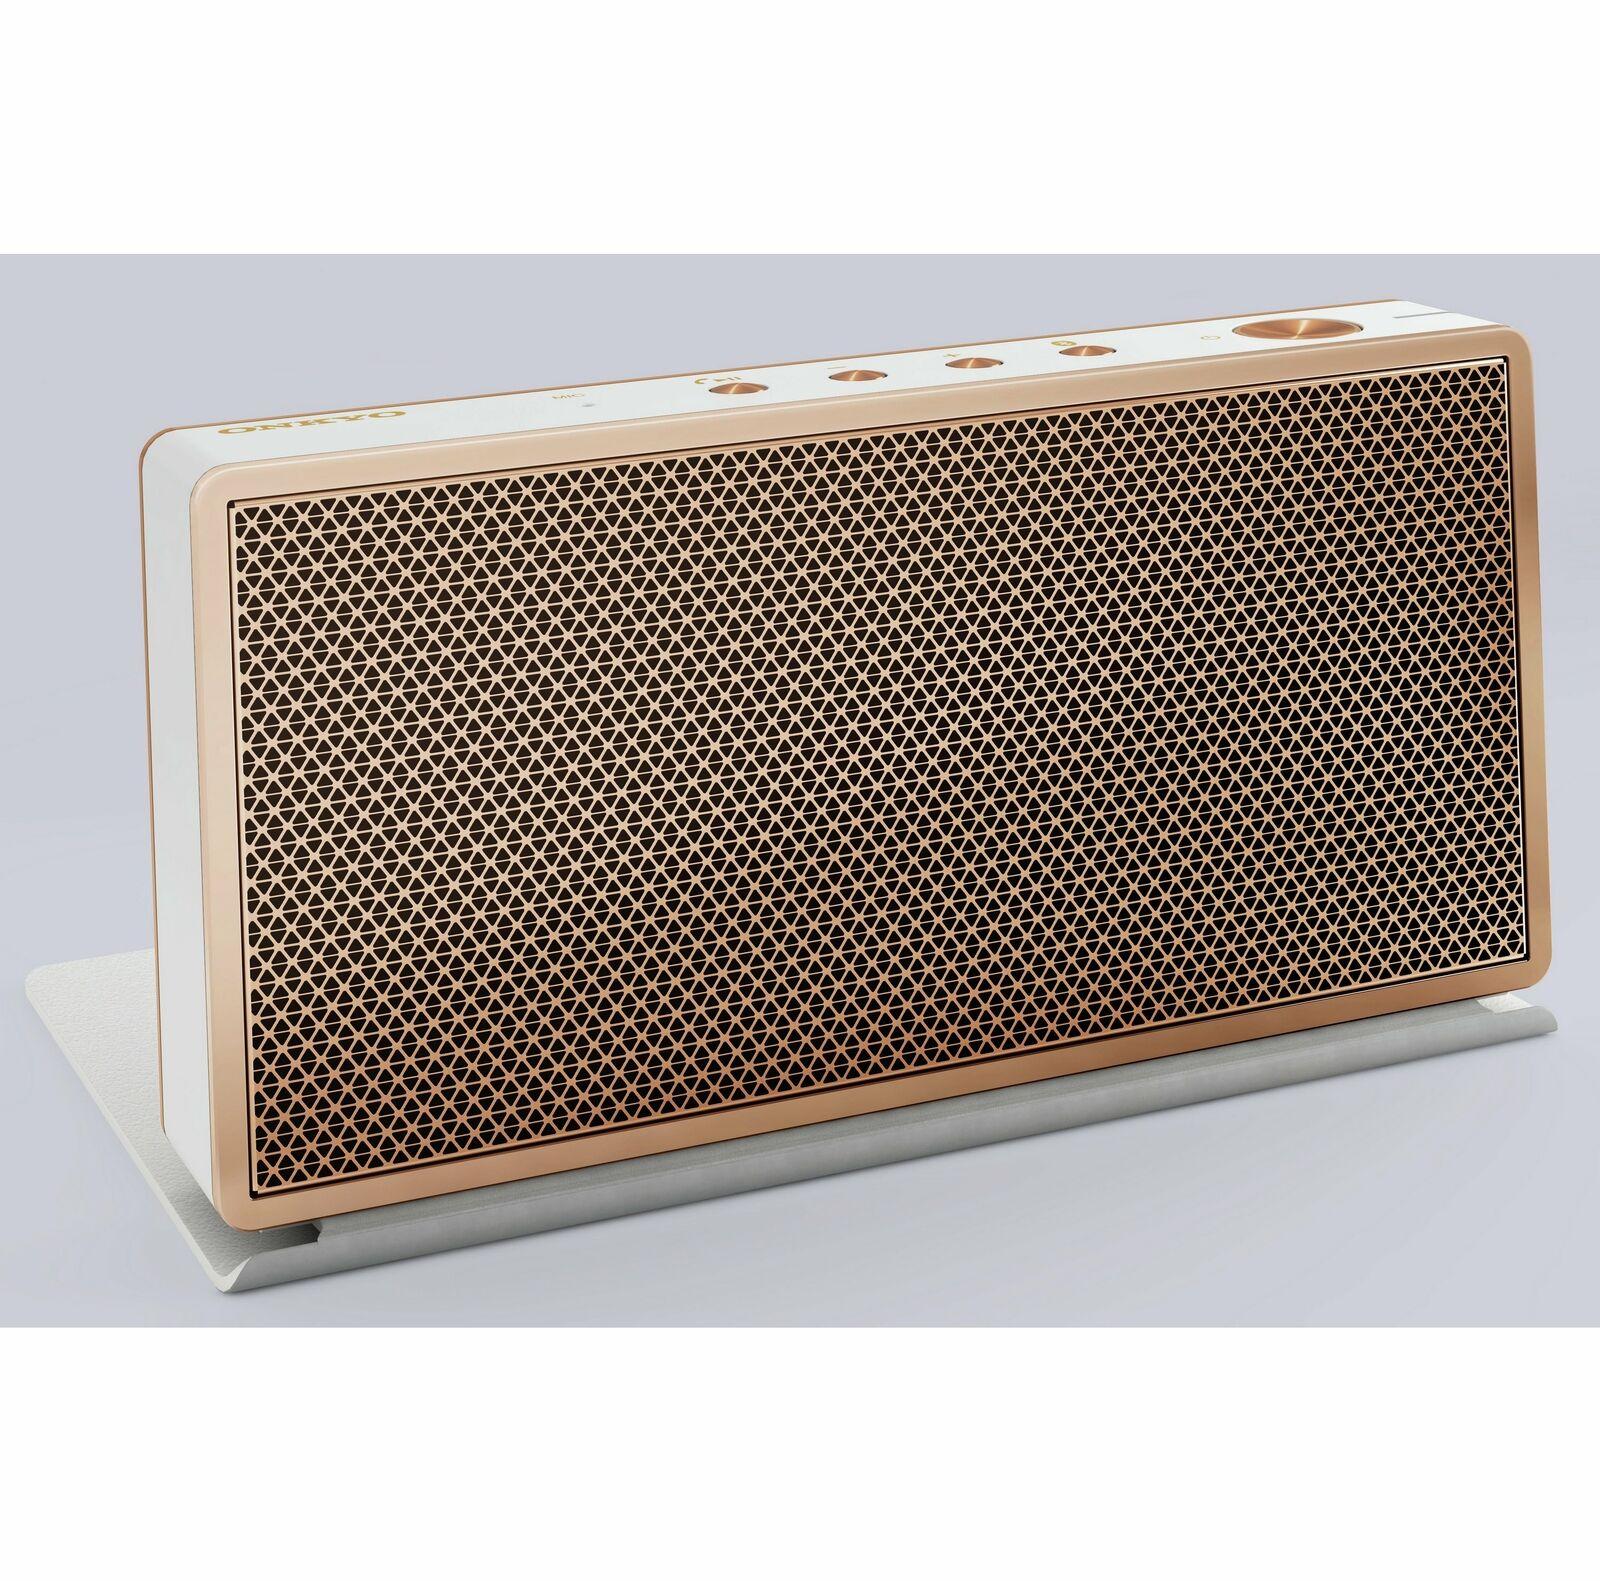 Onkyo T3 Bluetooth Travel Speaker - White £49.99 @ Argos Ebay